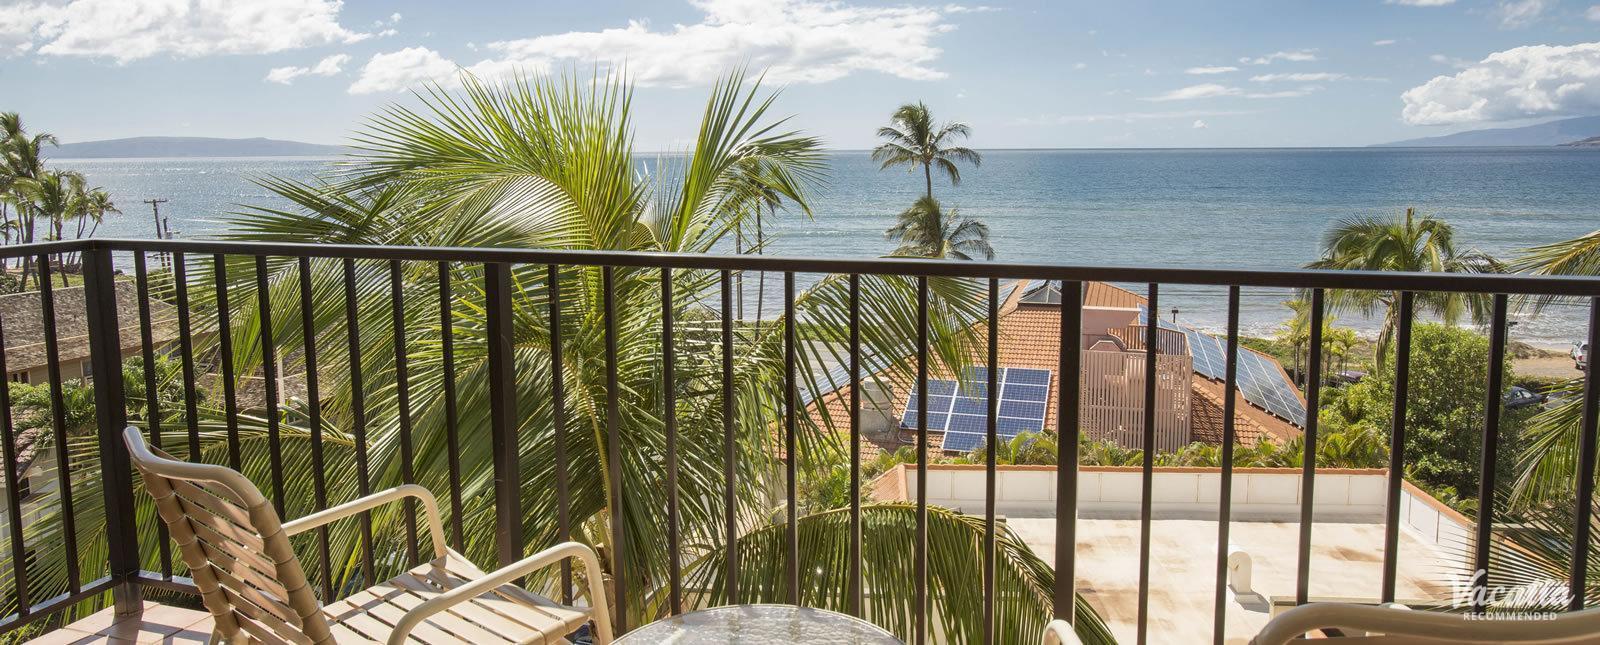 Royal Sunset Beach Club Private Rentals